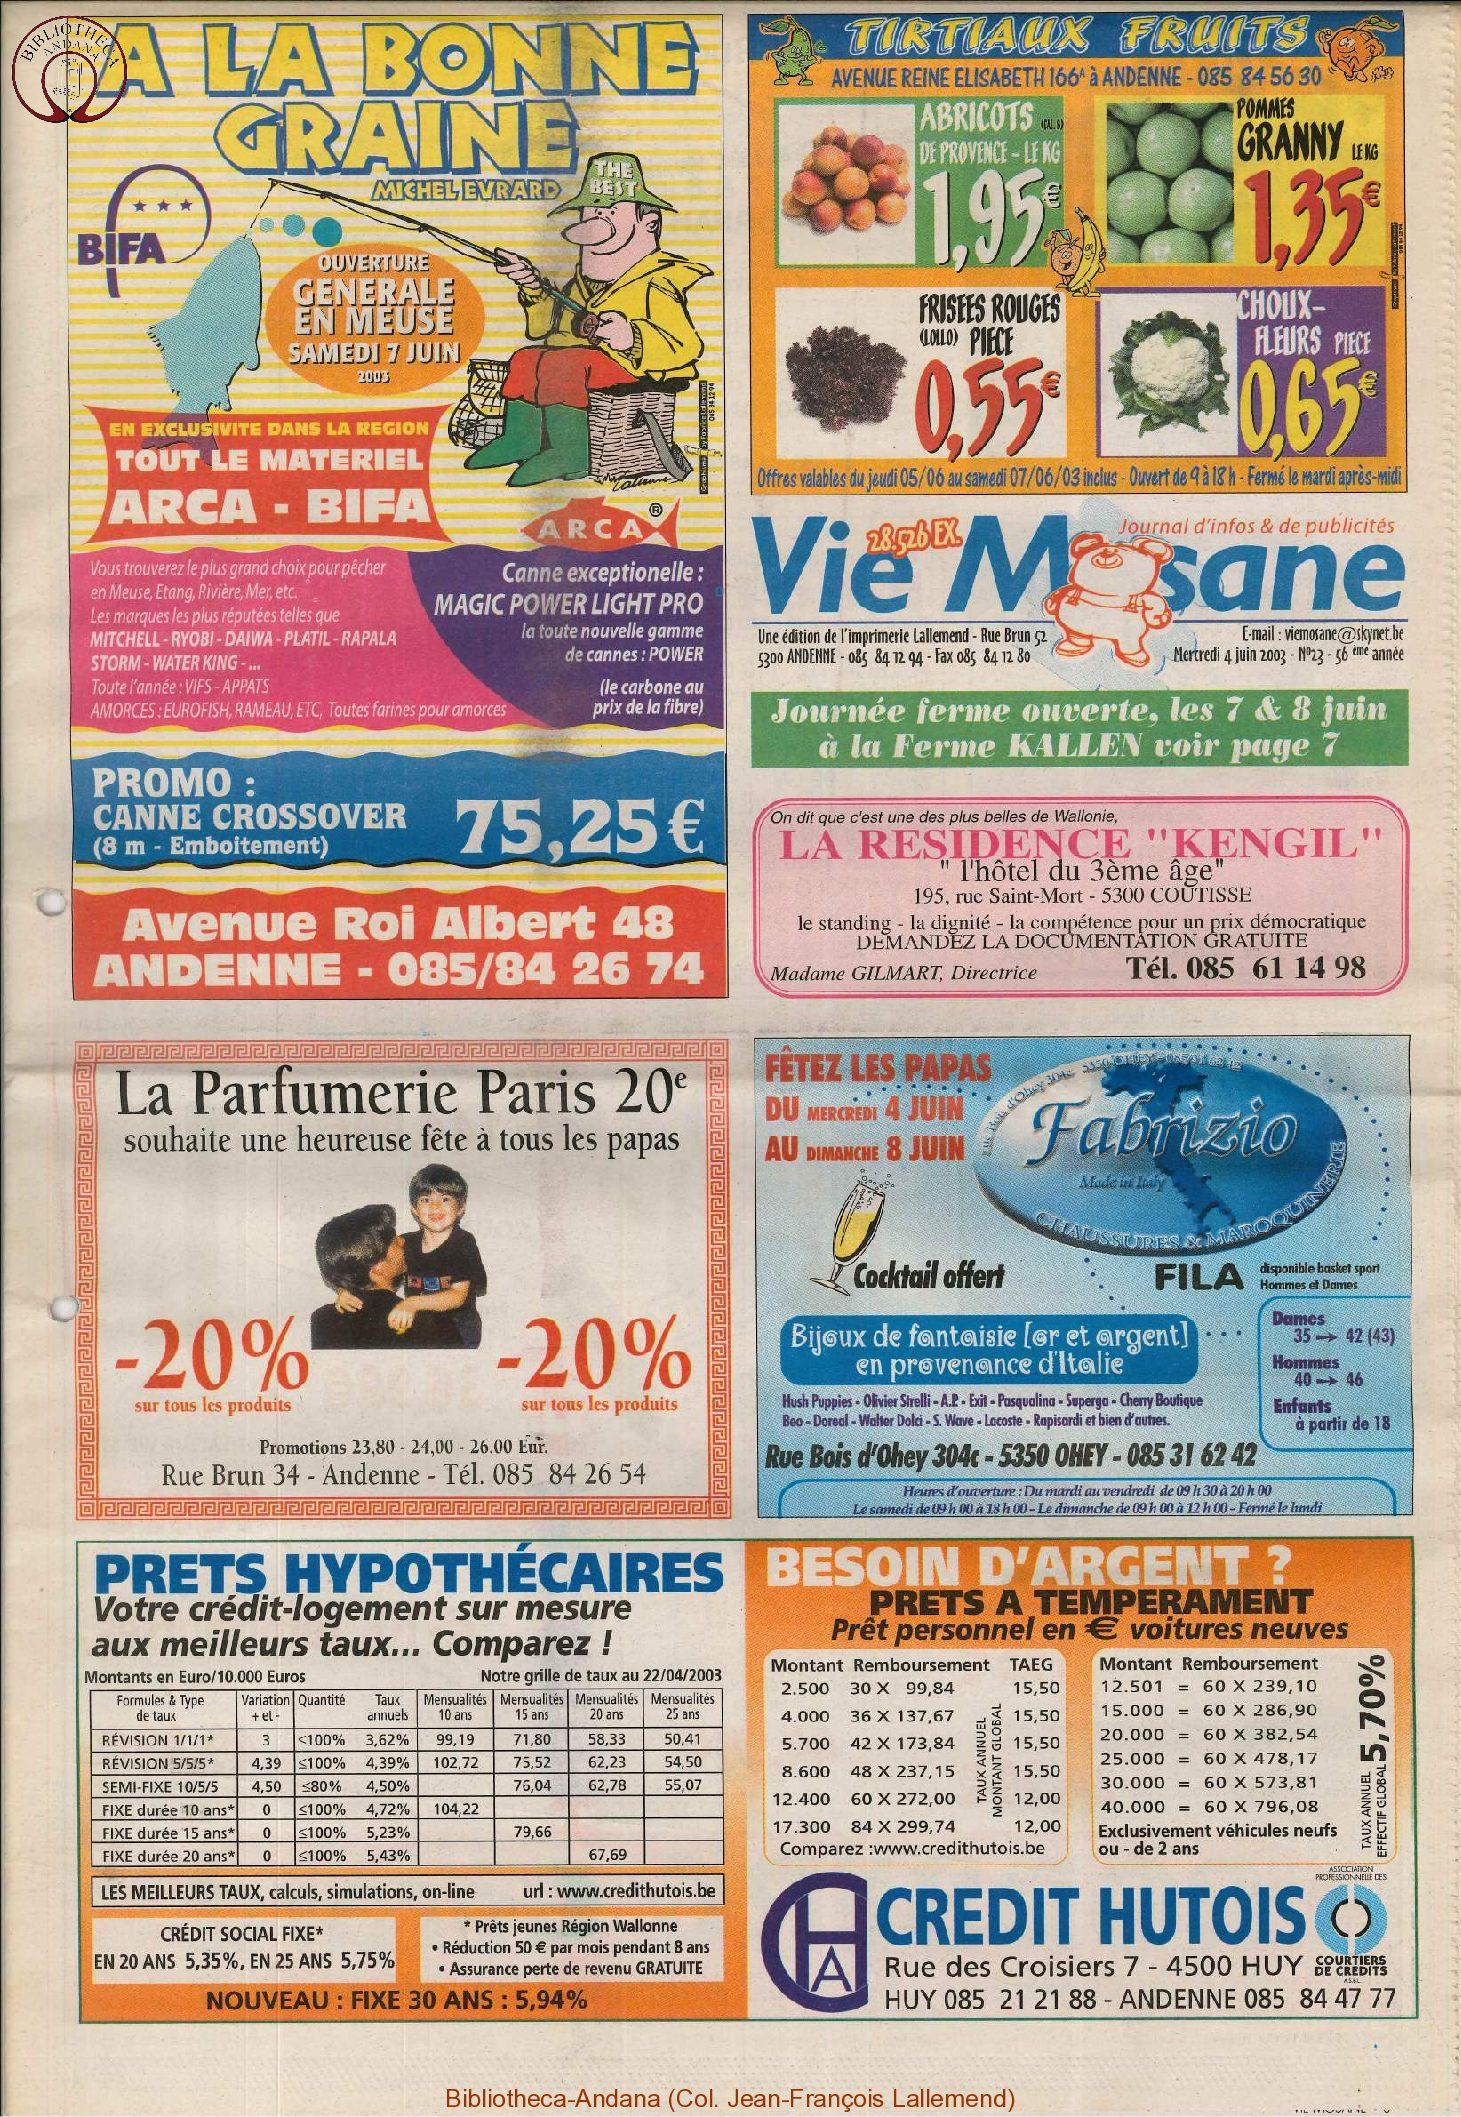 57e année - n°23 - 4 juin 2003